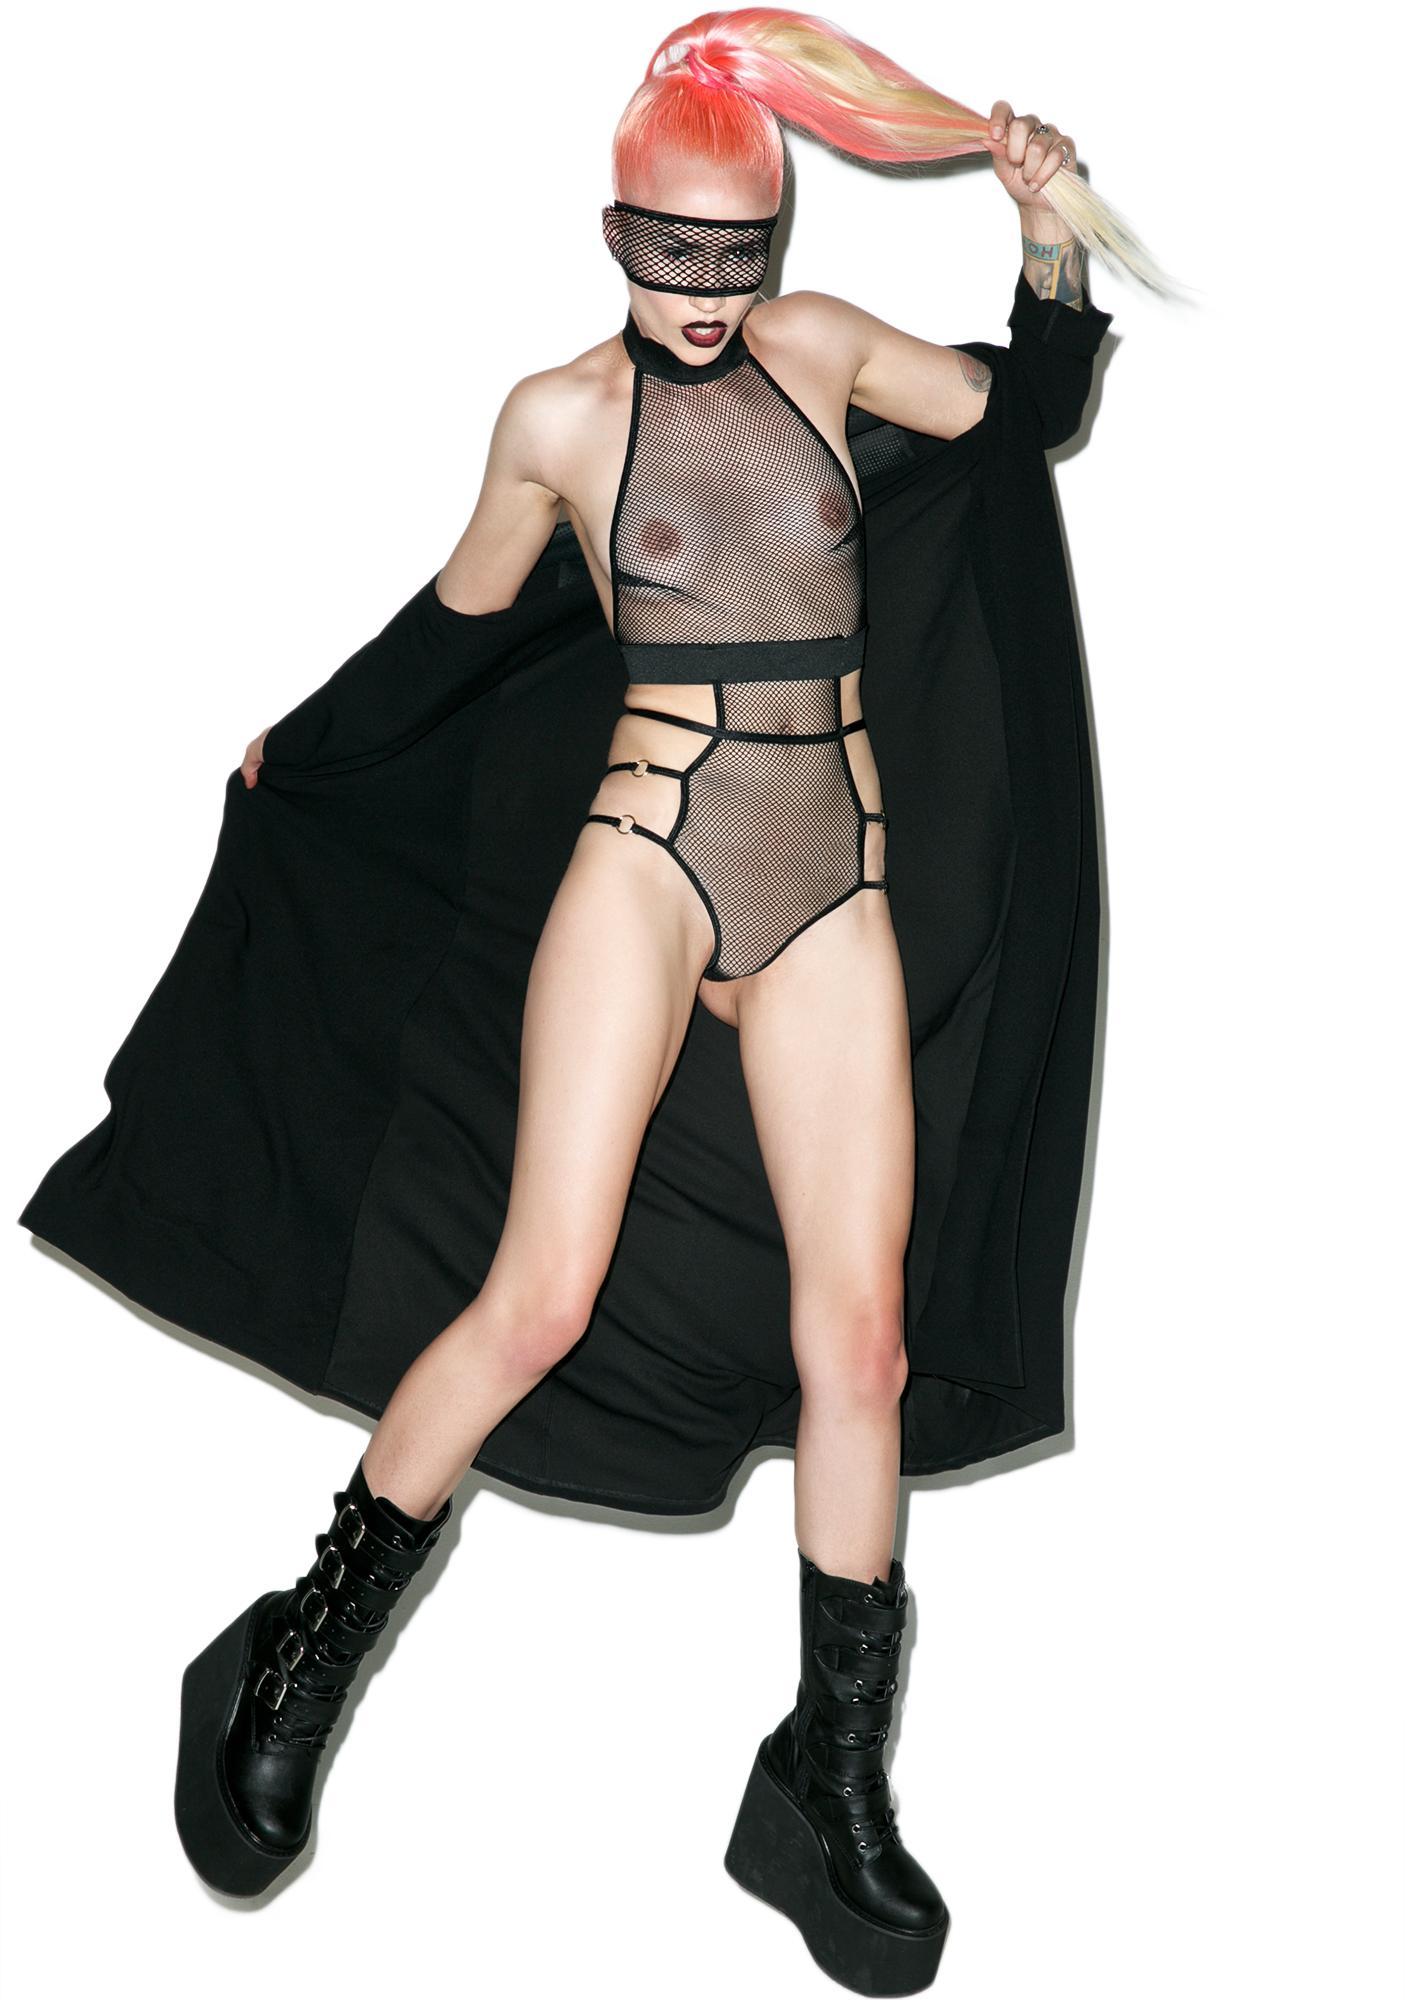 Illicit Affair Bodysuit Set